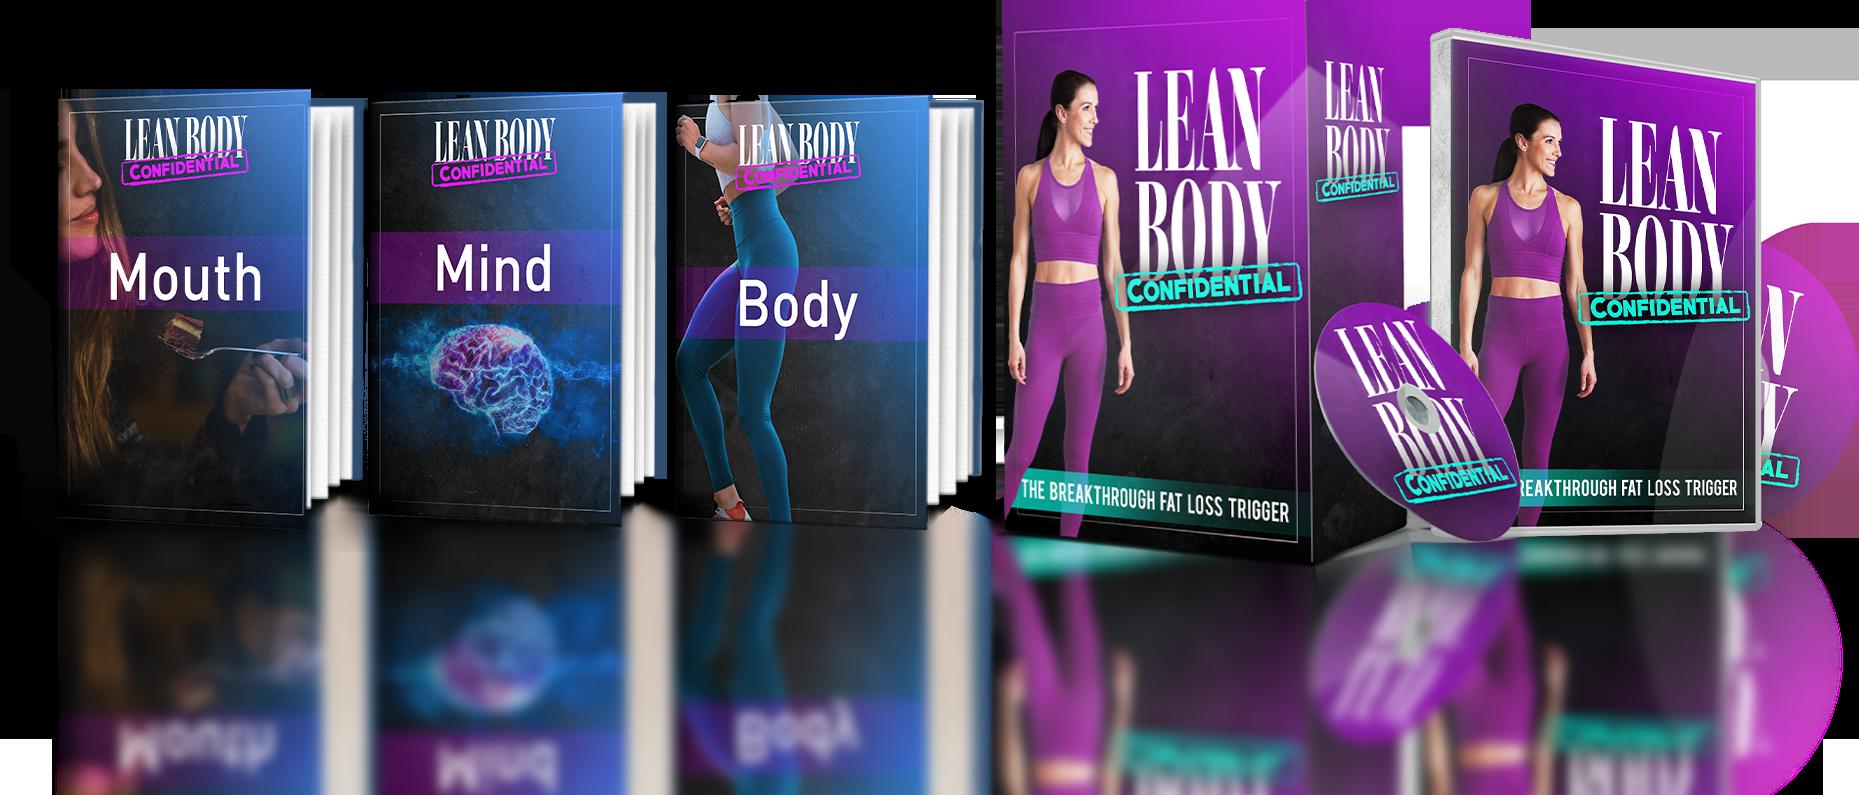 Lean Body ConFidential Program Reviews